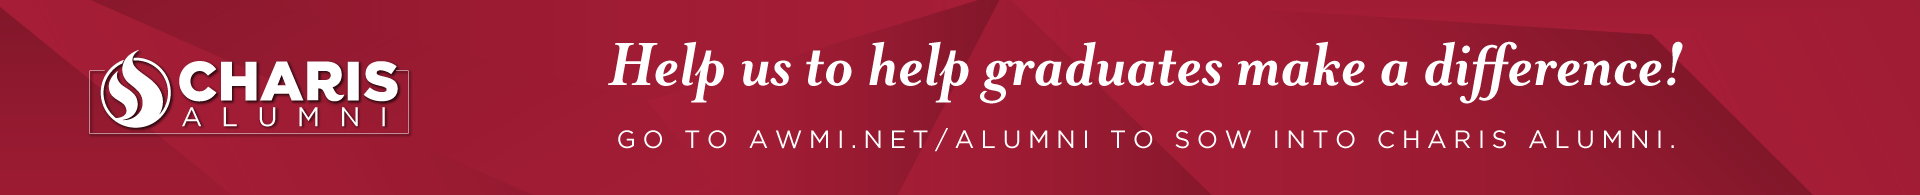 Navigate to alumni page on awmi.net